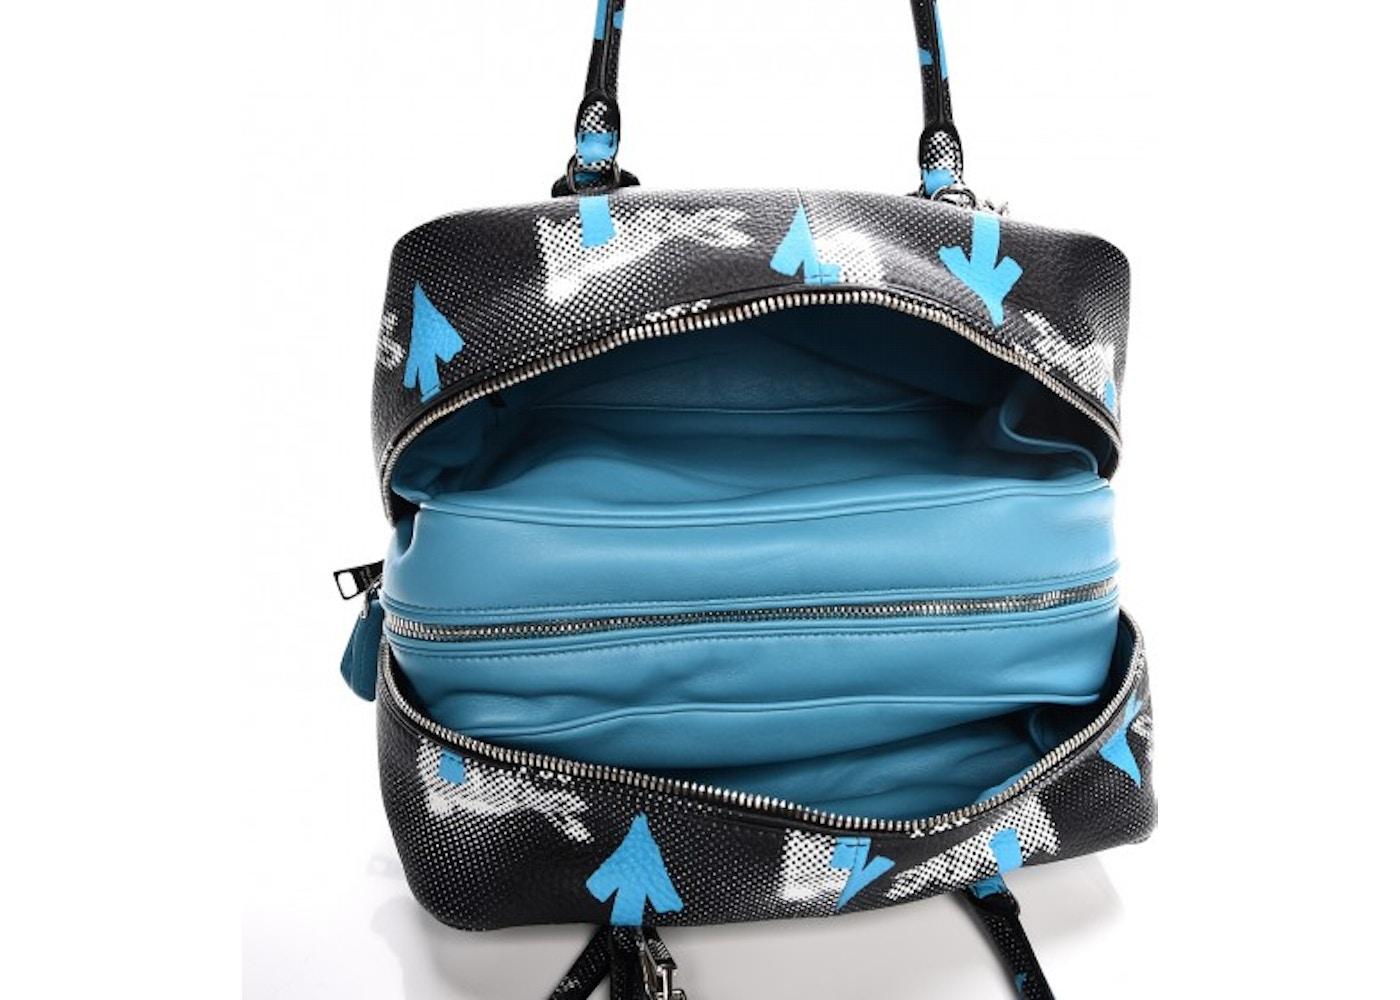 cdf732e809d1 Prada Saint Rabbit Inside Bag Shoulder Bag Vitello Daino Nero Multicolor